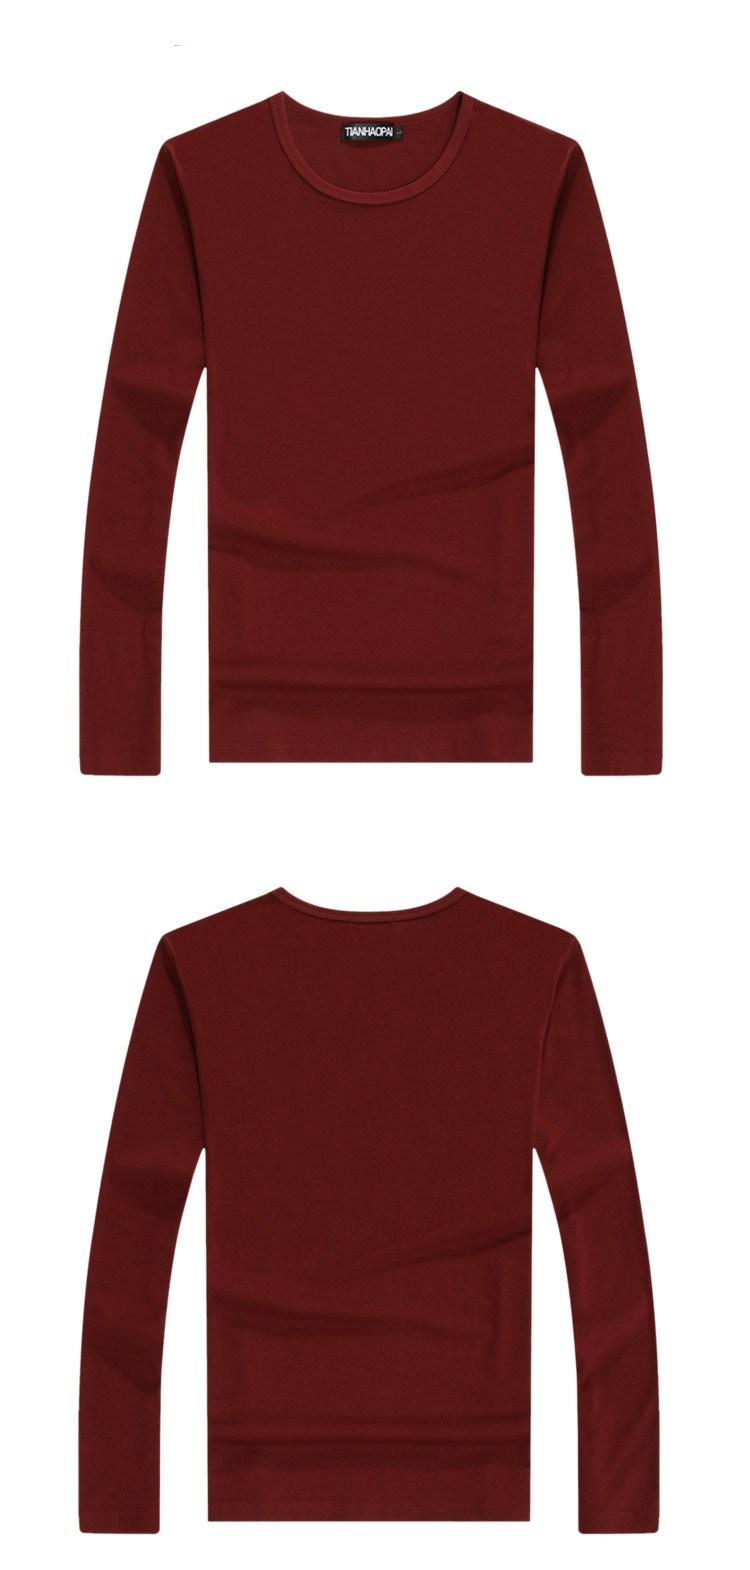 Plain blank custom printing long sleeve t shirts buy for Personalized long sleeve t shirts